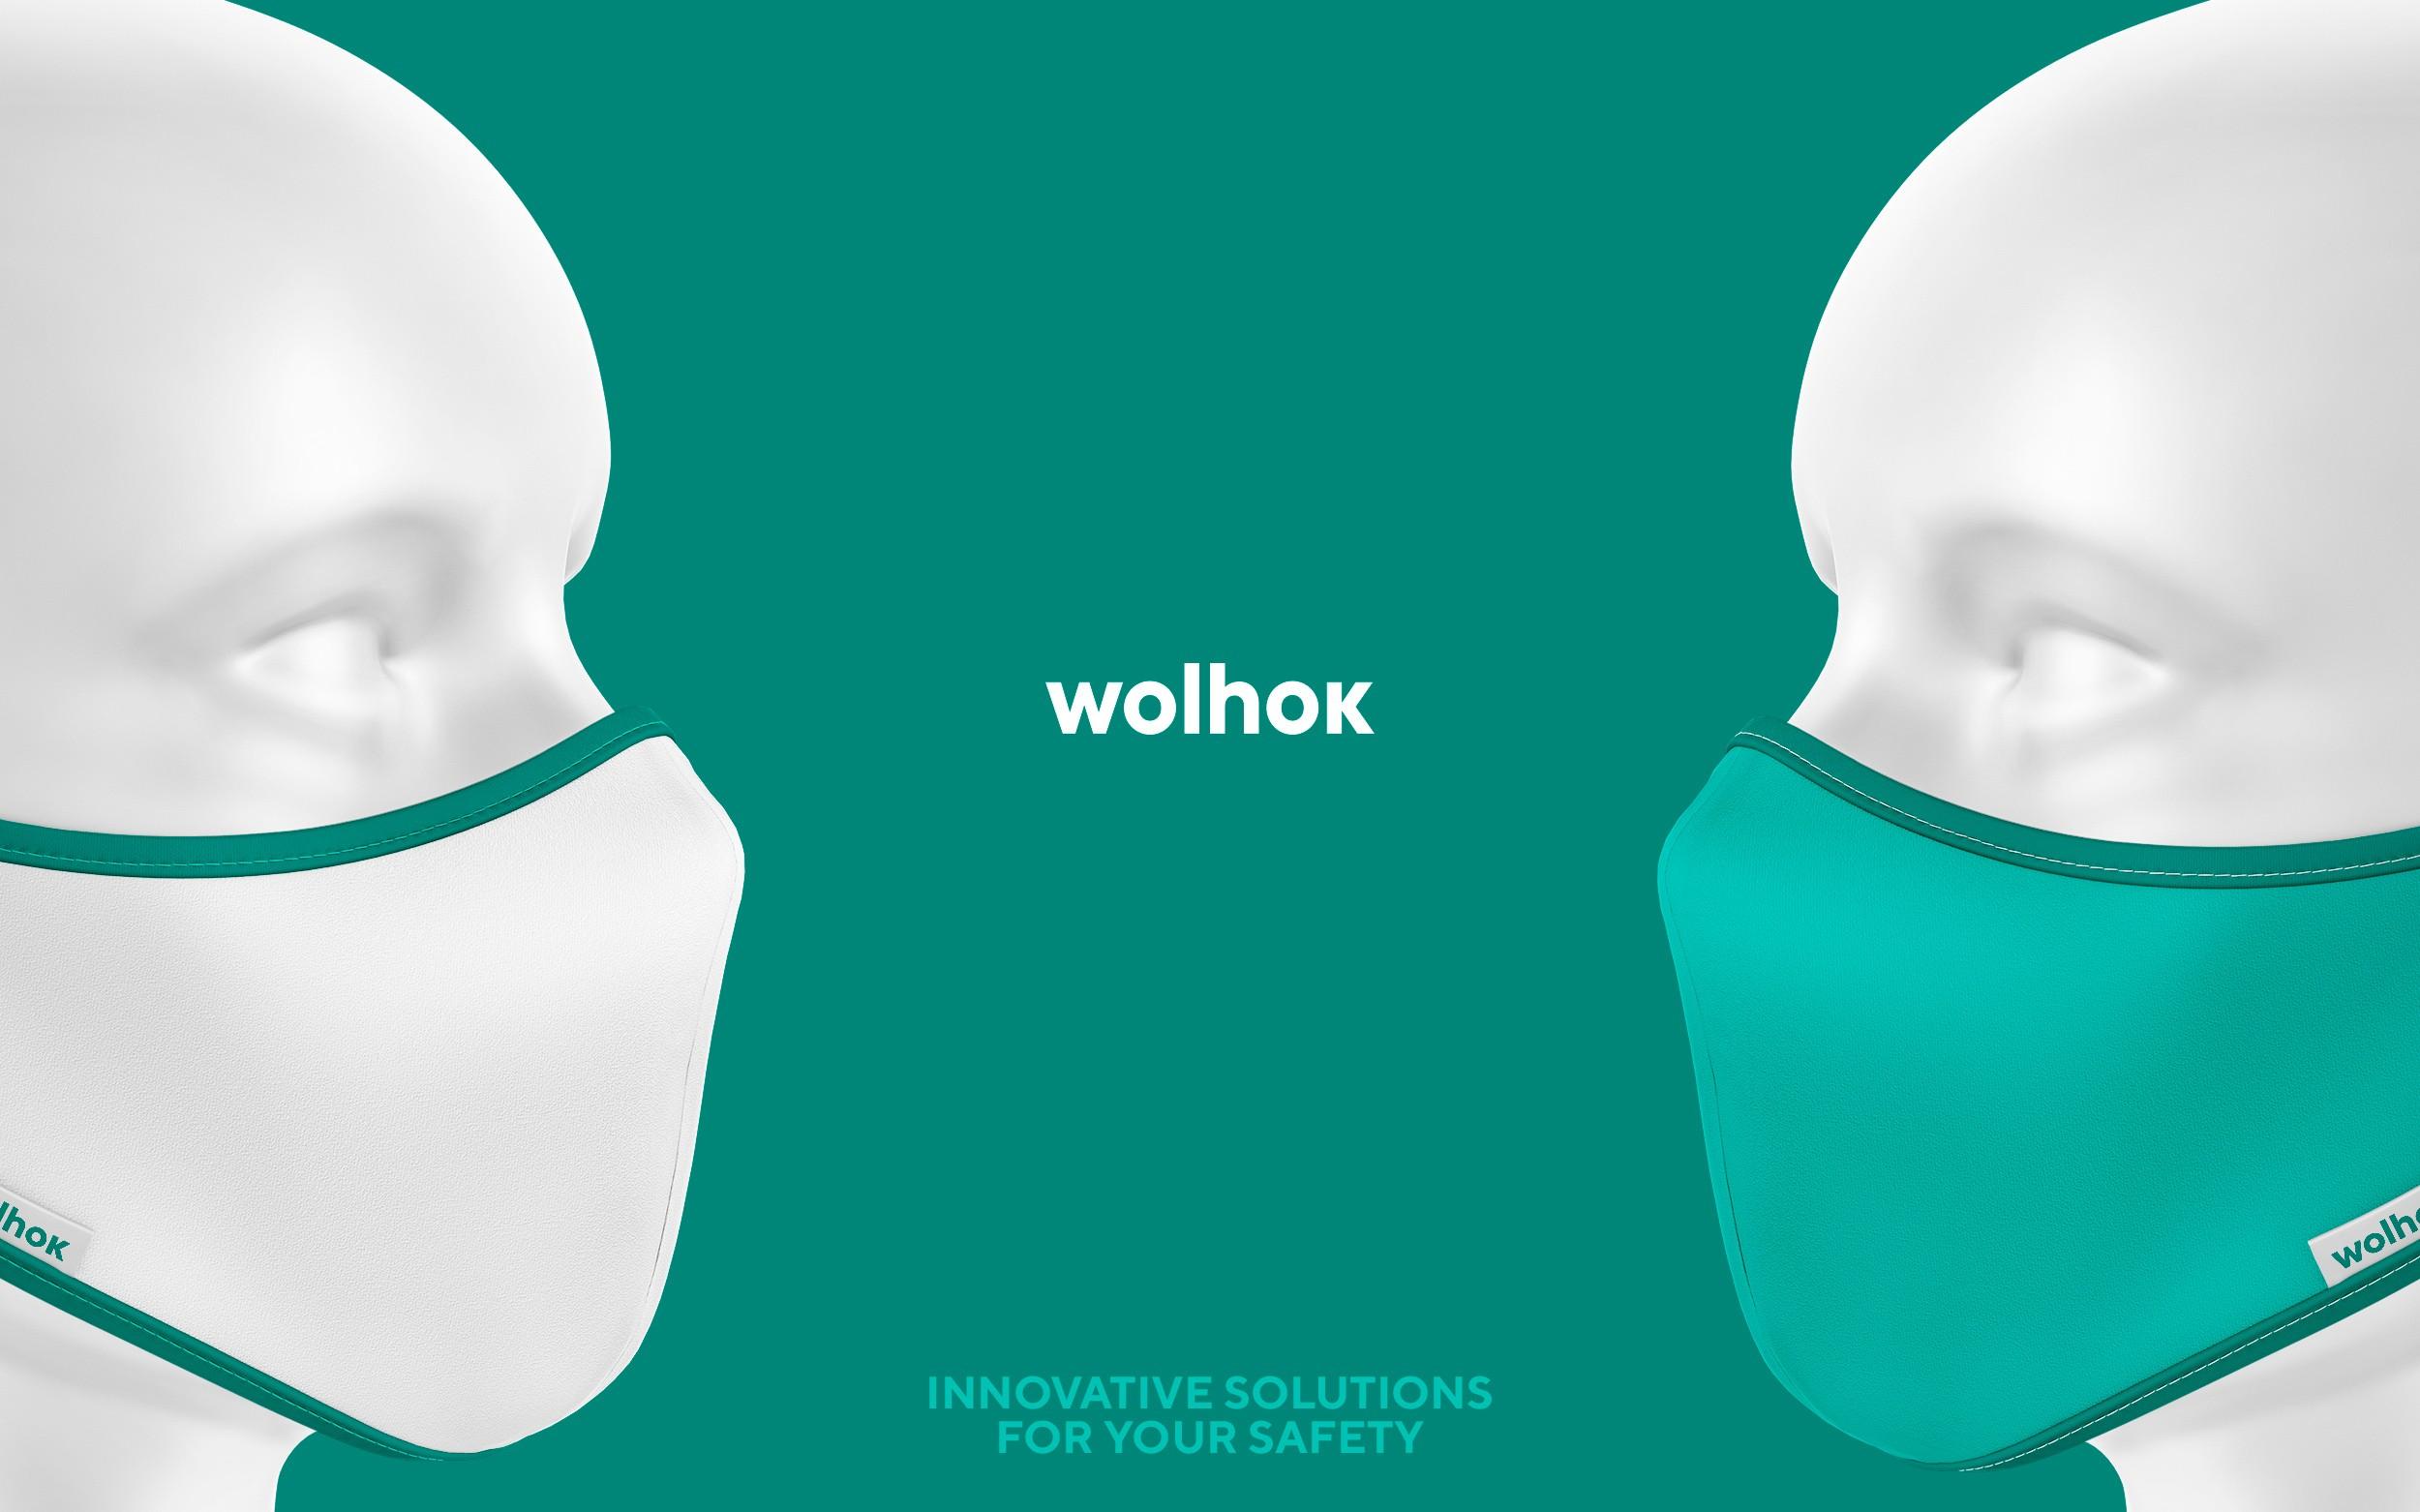 Wolhok